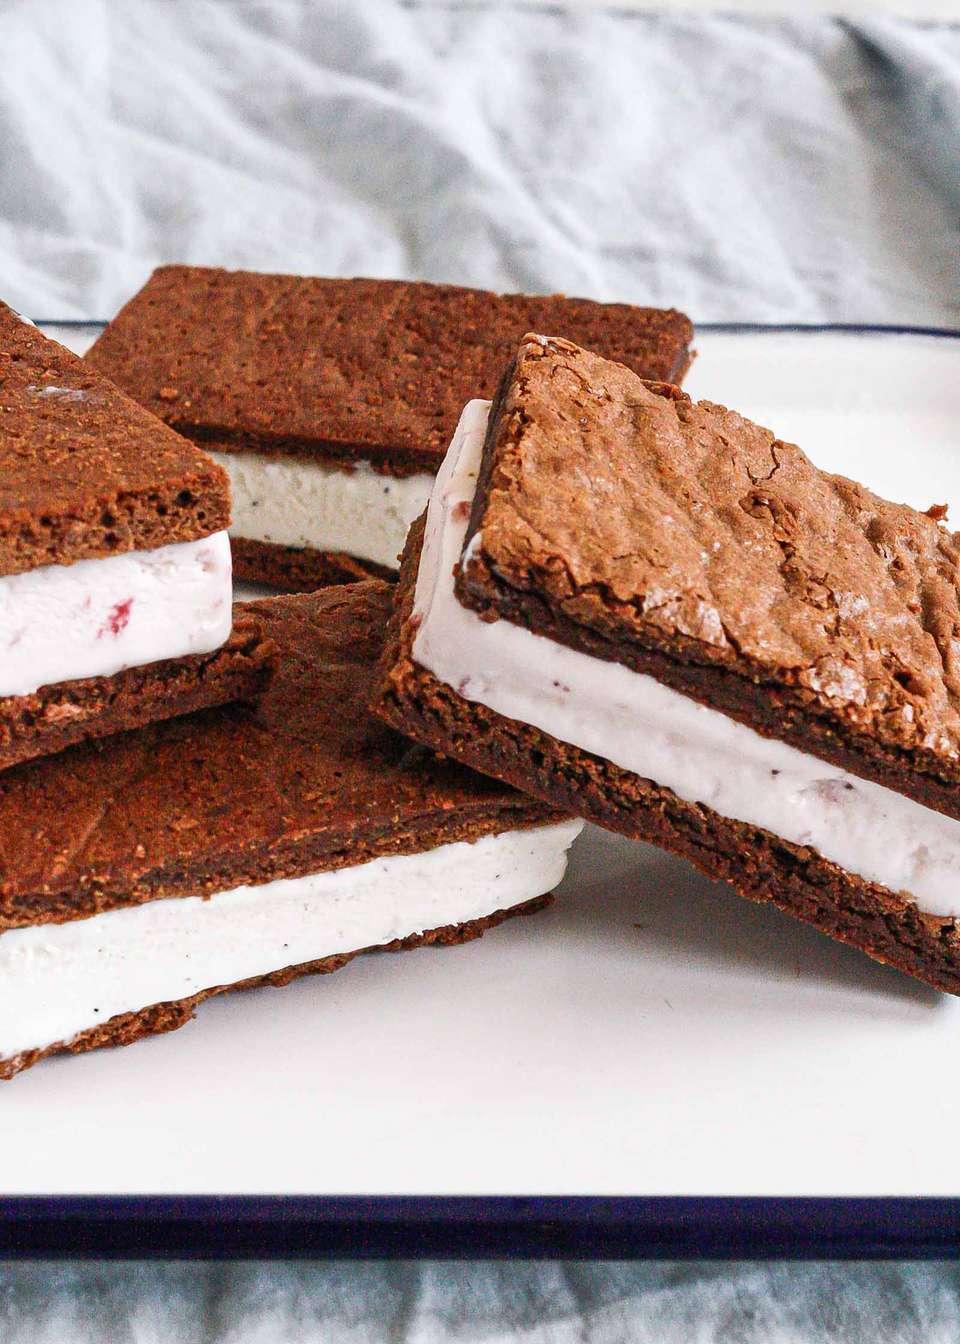 Ice Cream Sandwich Dessert - ice cream sandwiches in a row